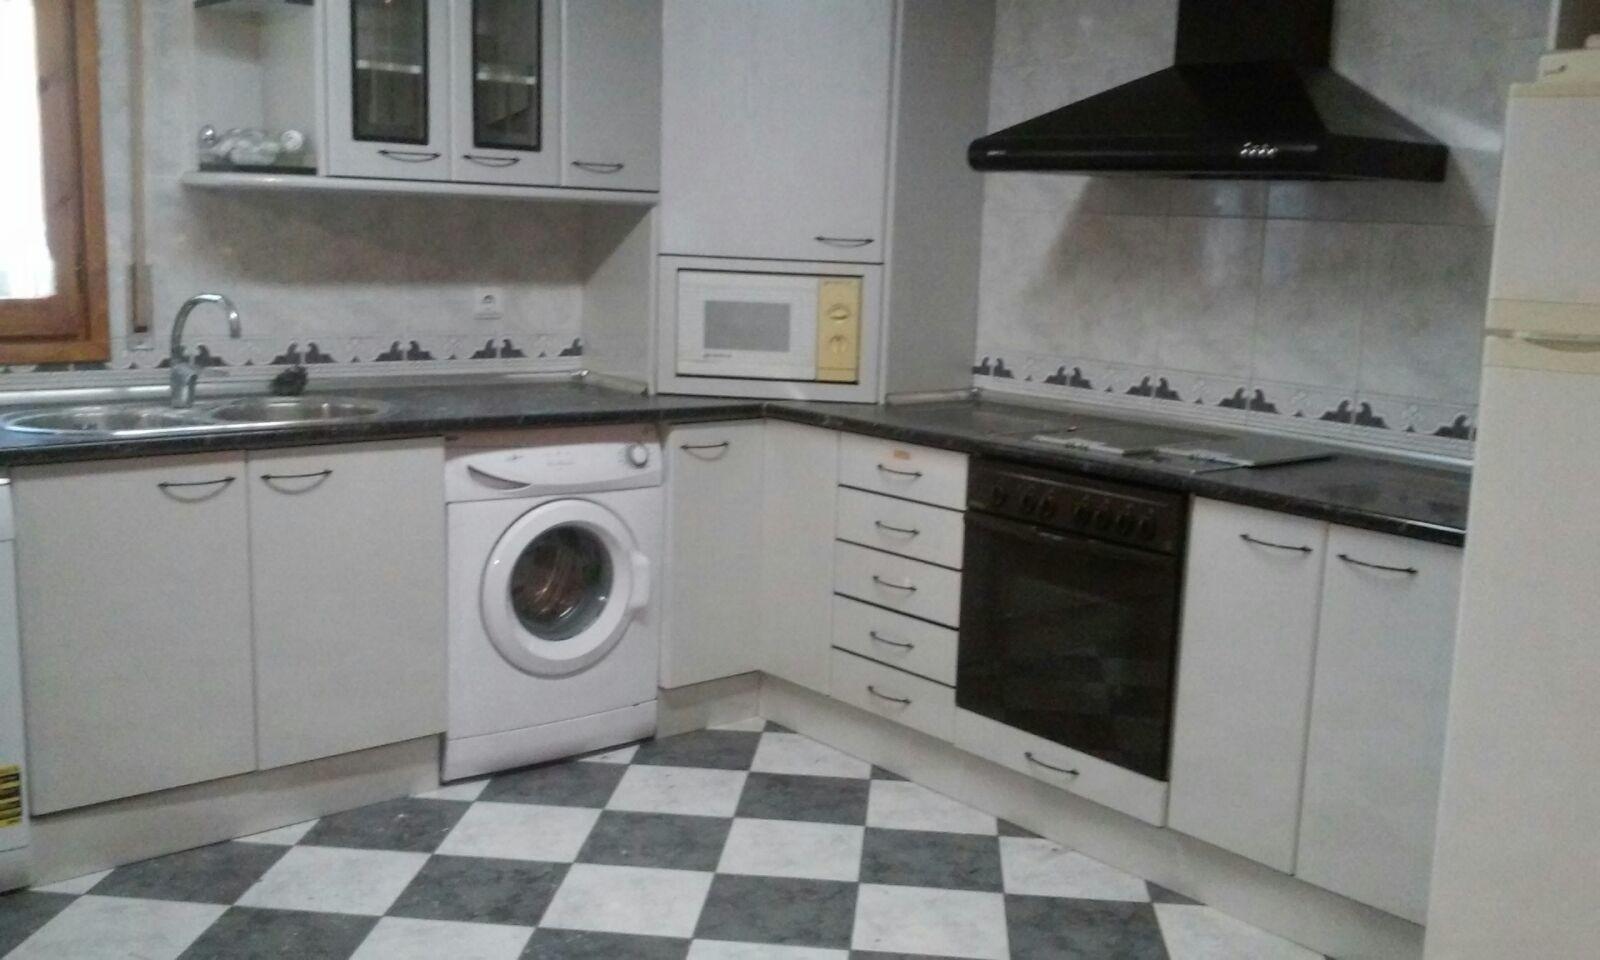 habitacion-urbanizacion-zaragoza-a403366